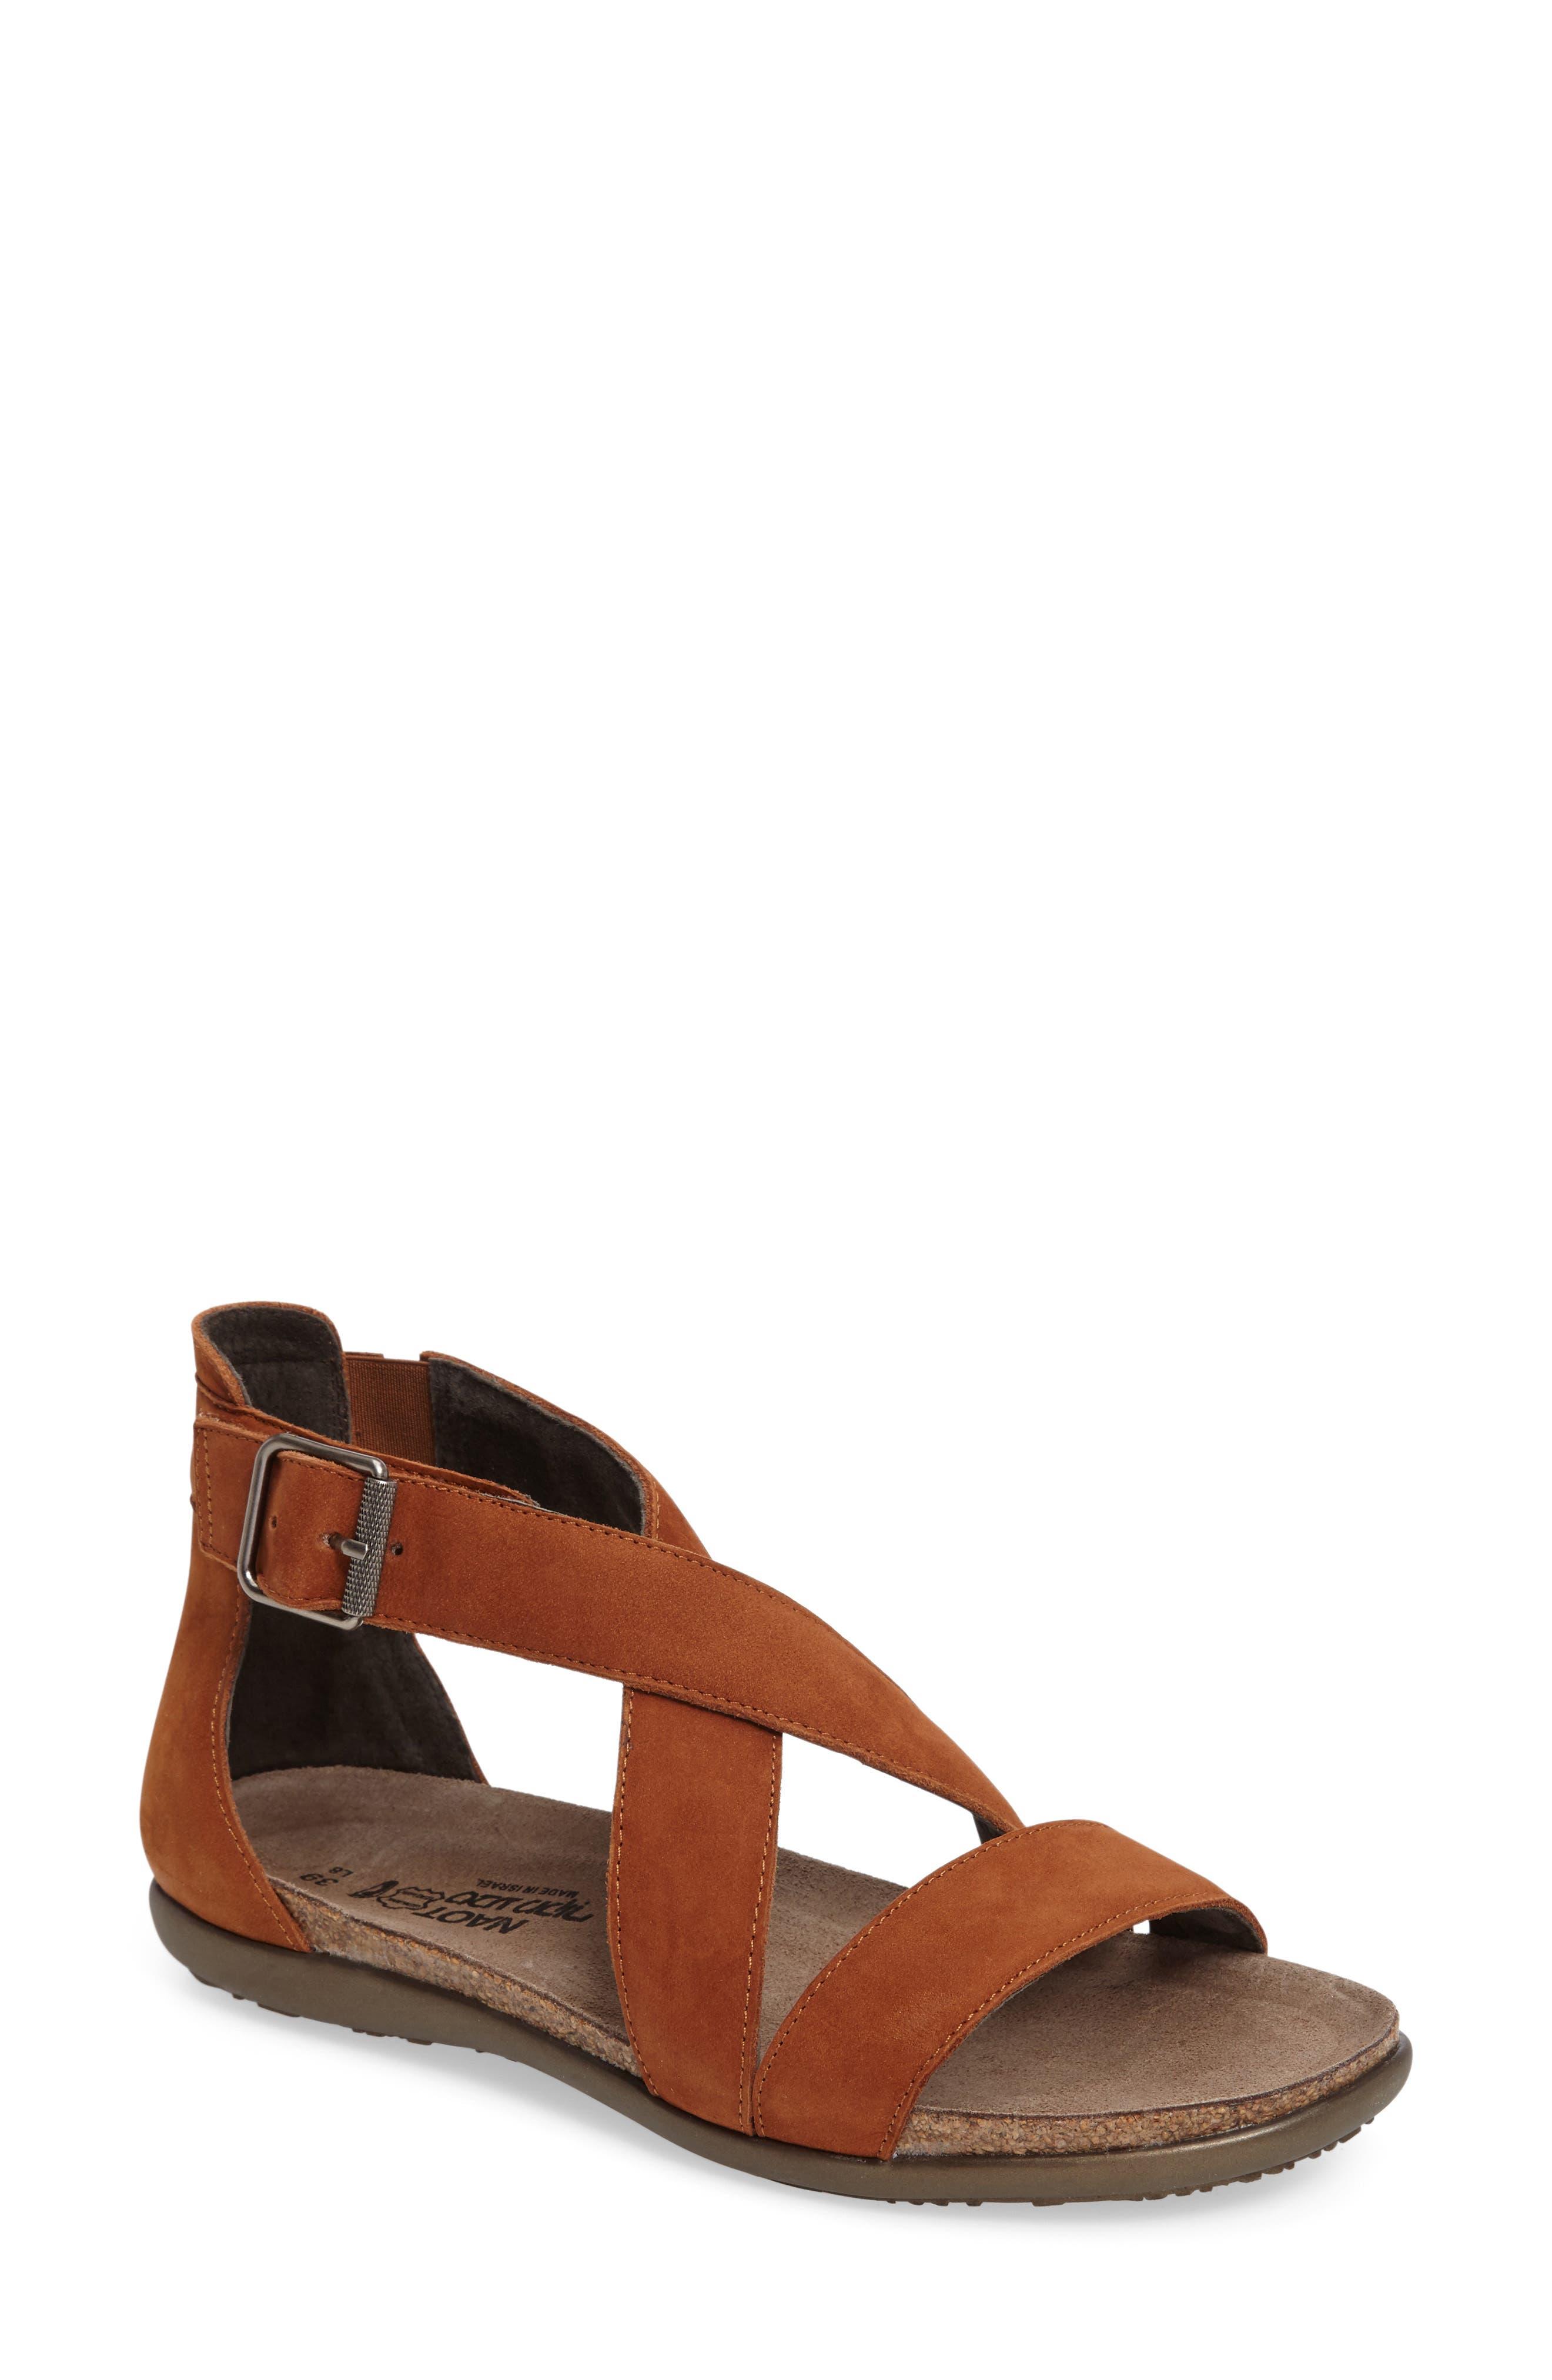 NAOT | Rianna Crisscross Sandal